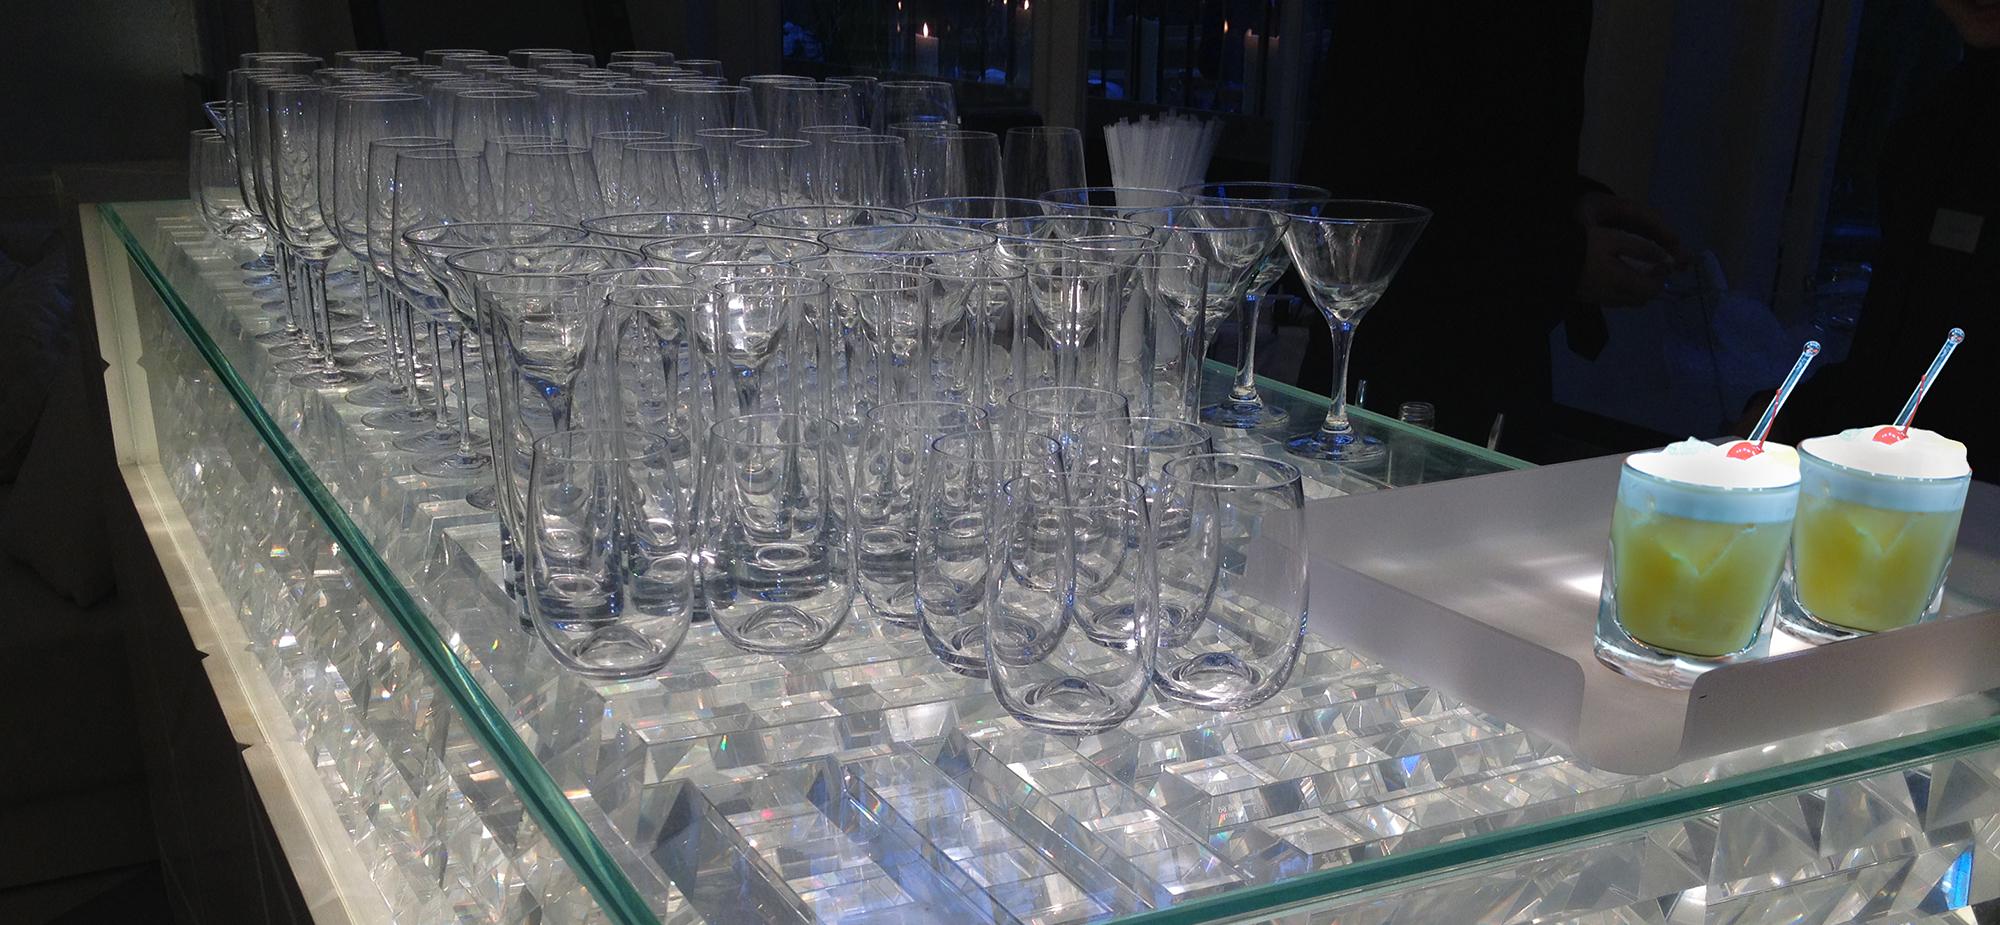 event-service-festival-bar-staff-caterers-portable-bar